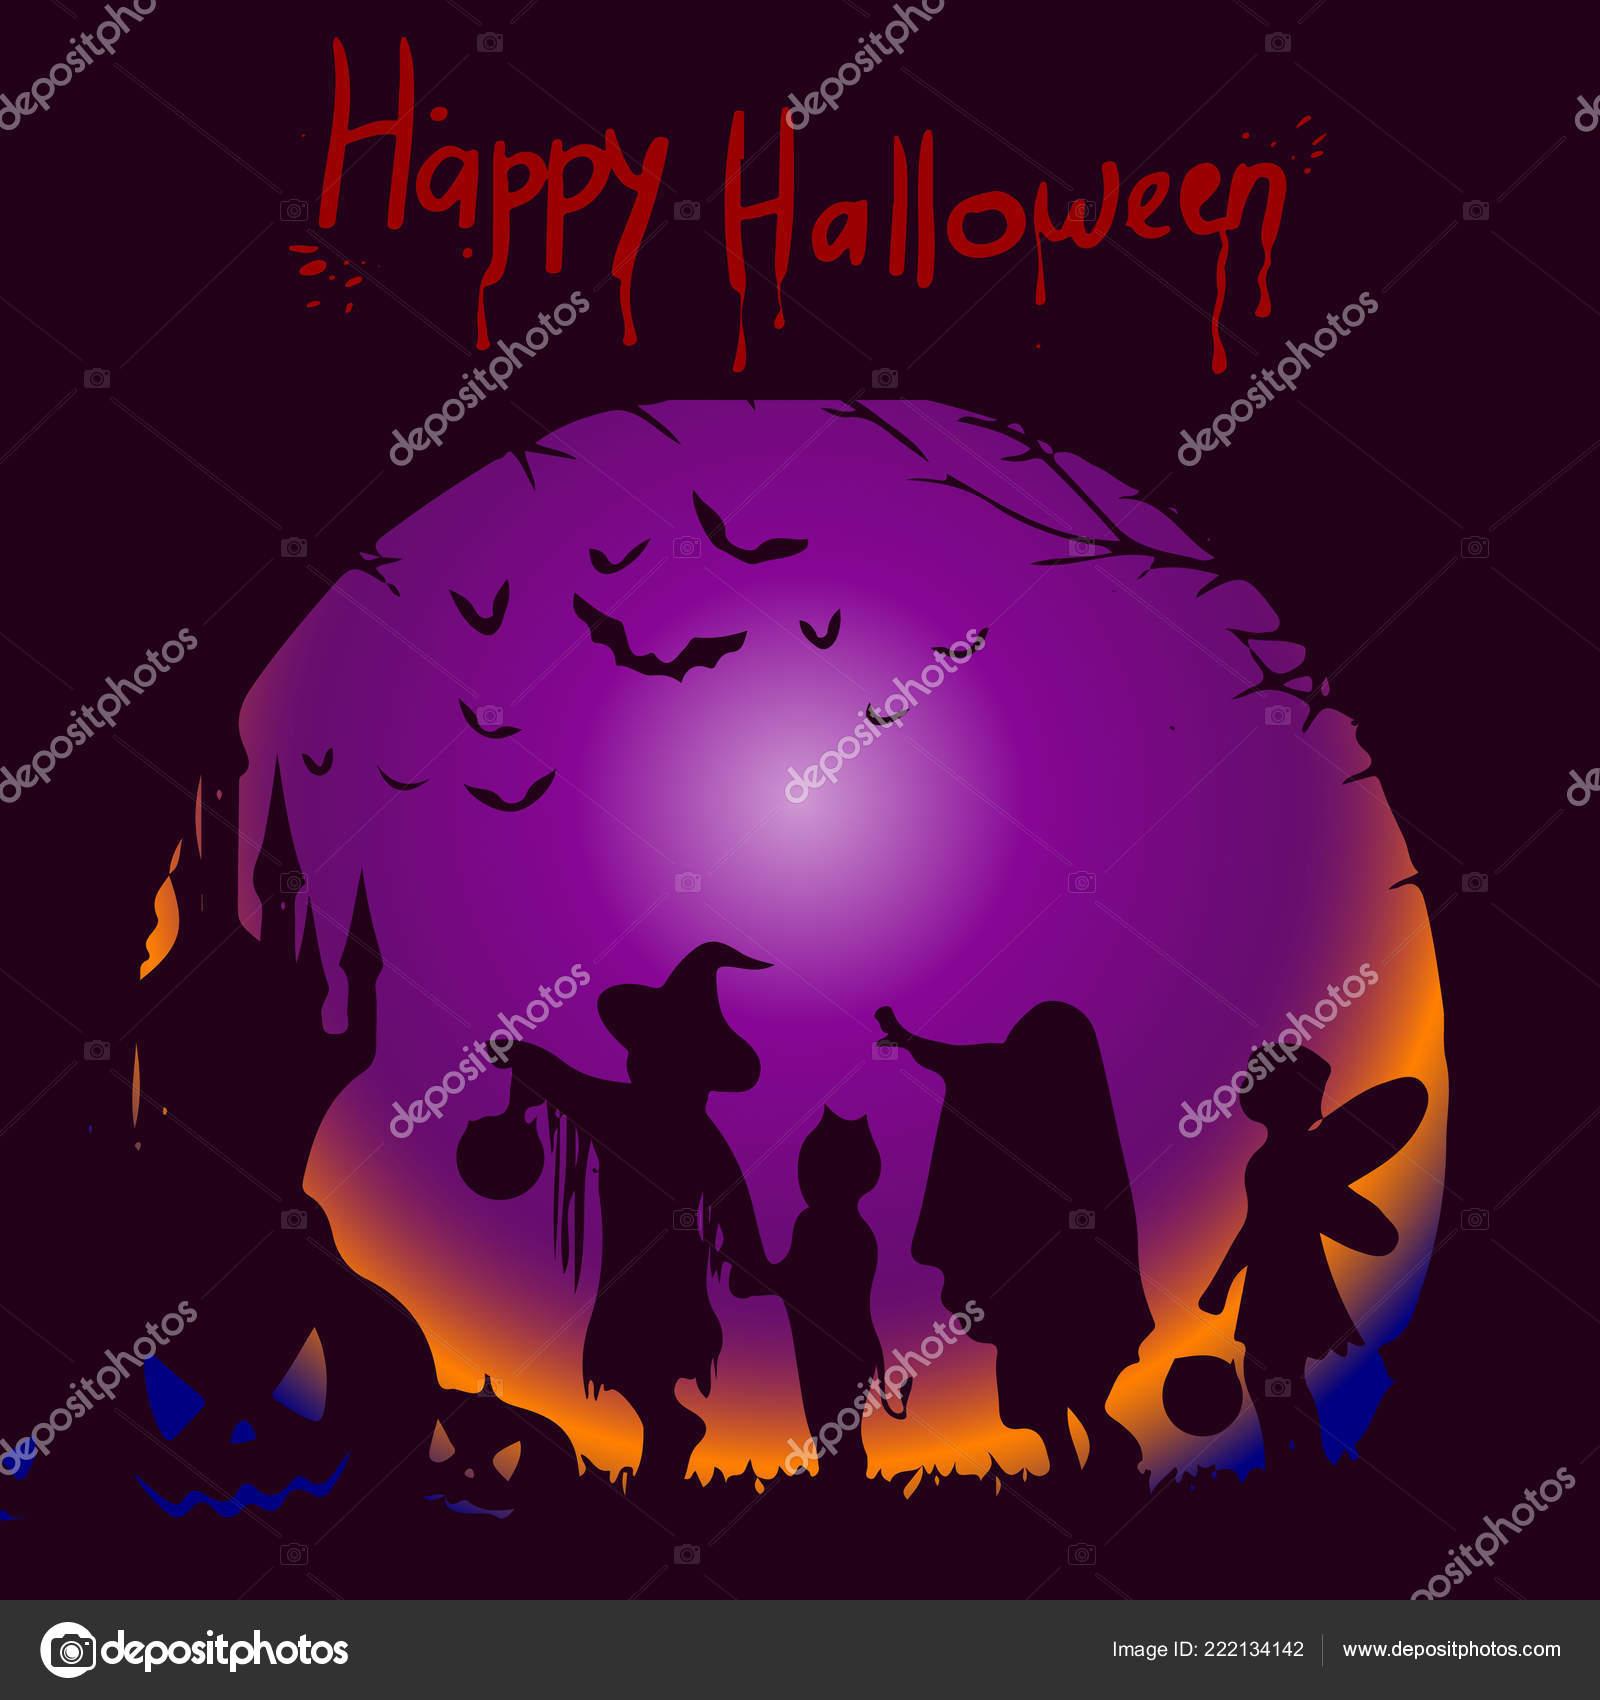 Template Illustration Holiday Halloween Silhouette Character Dark